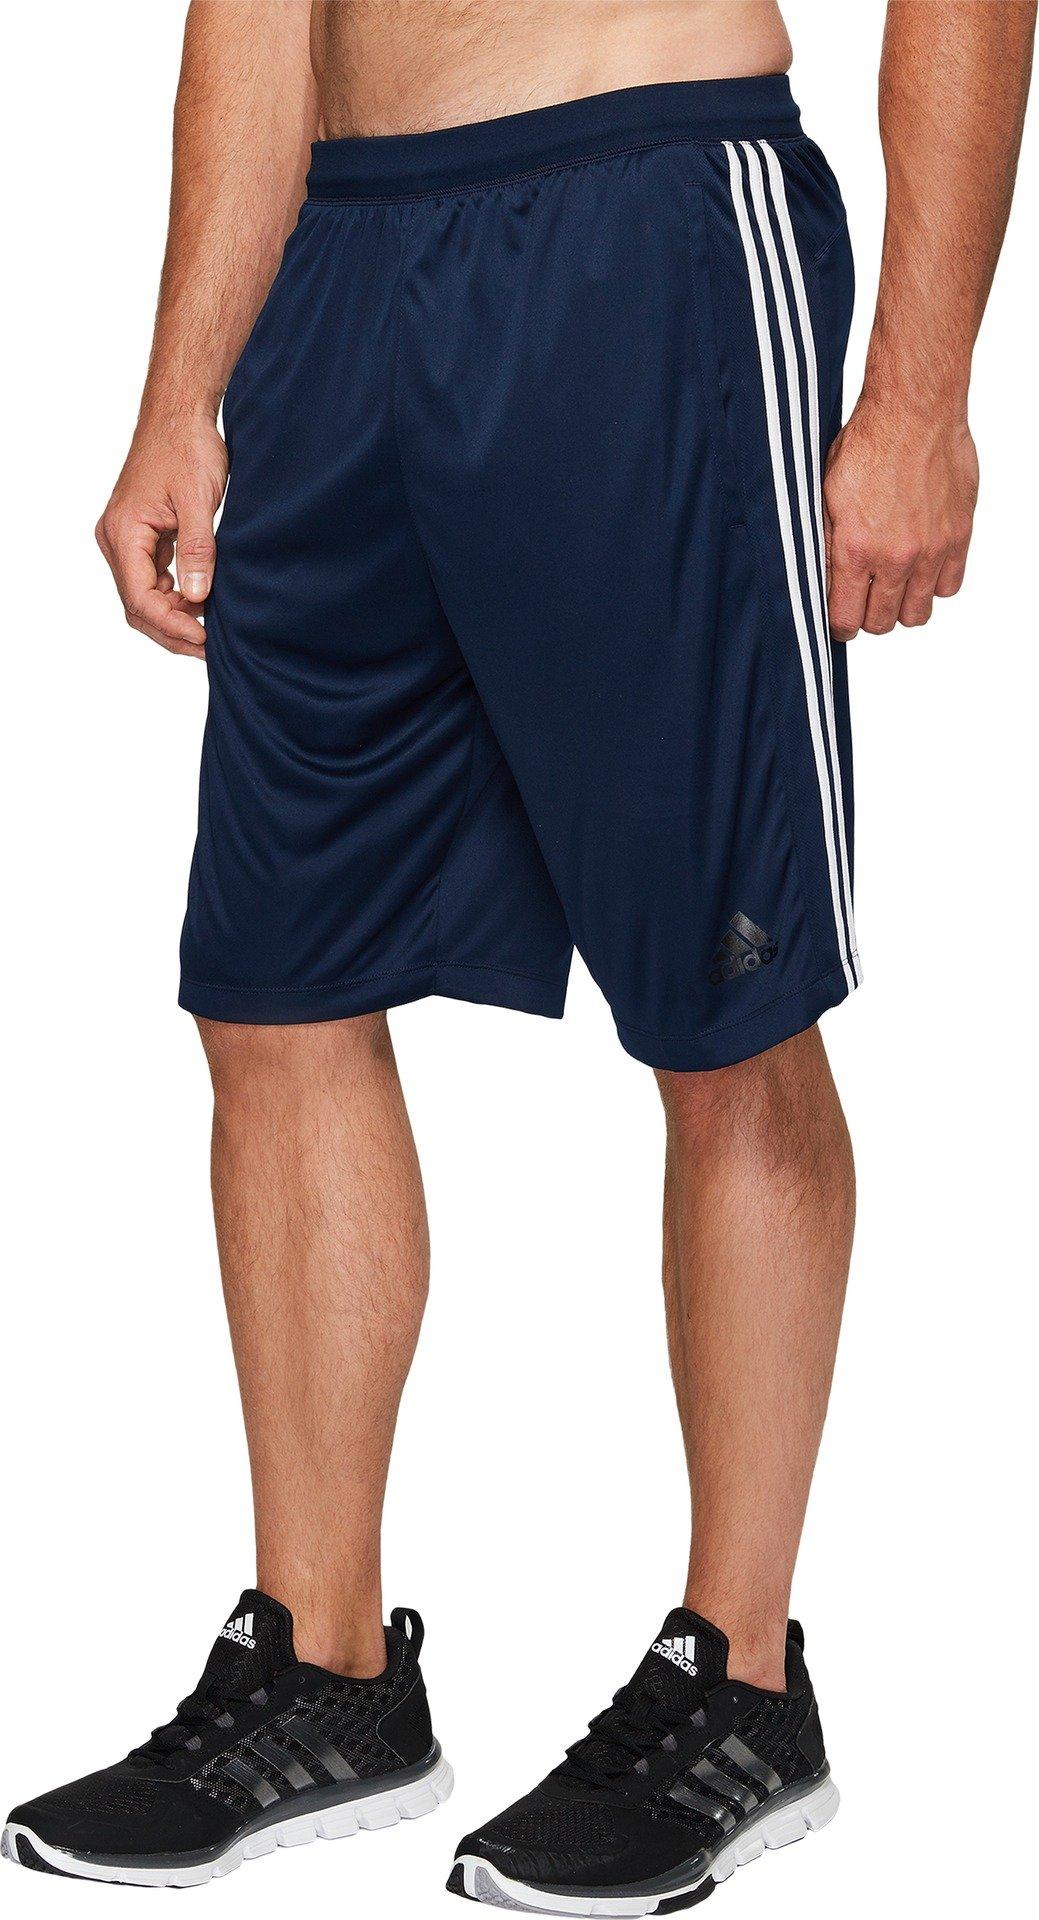 05facbb637b adidas Men's Big & Tall Designed-2-Move 3-Stripes Shorts Collegiate  Navy/Collegiate Navy/White LT 10